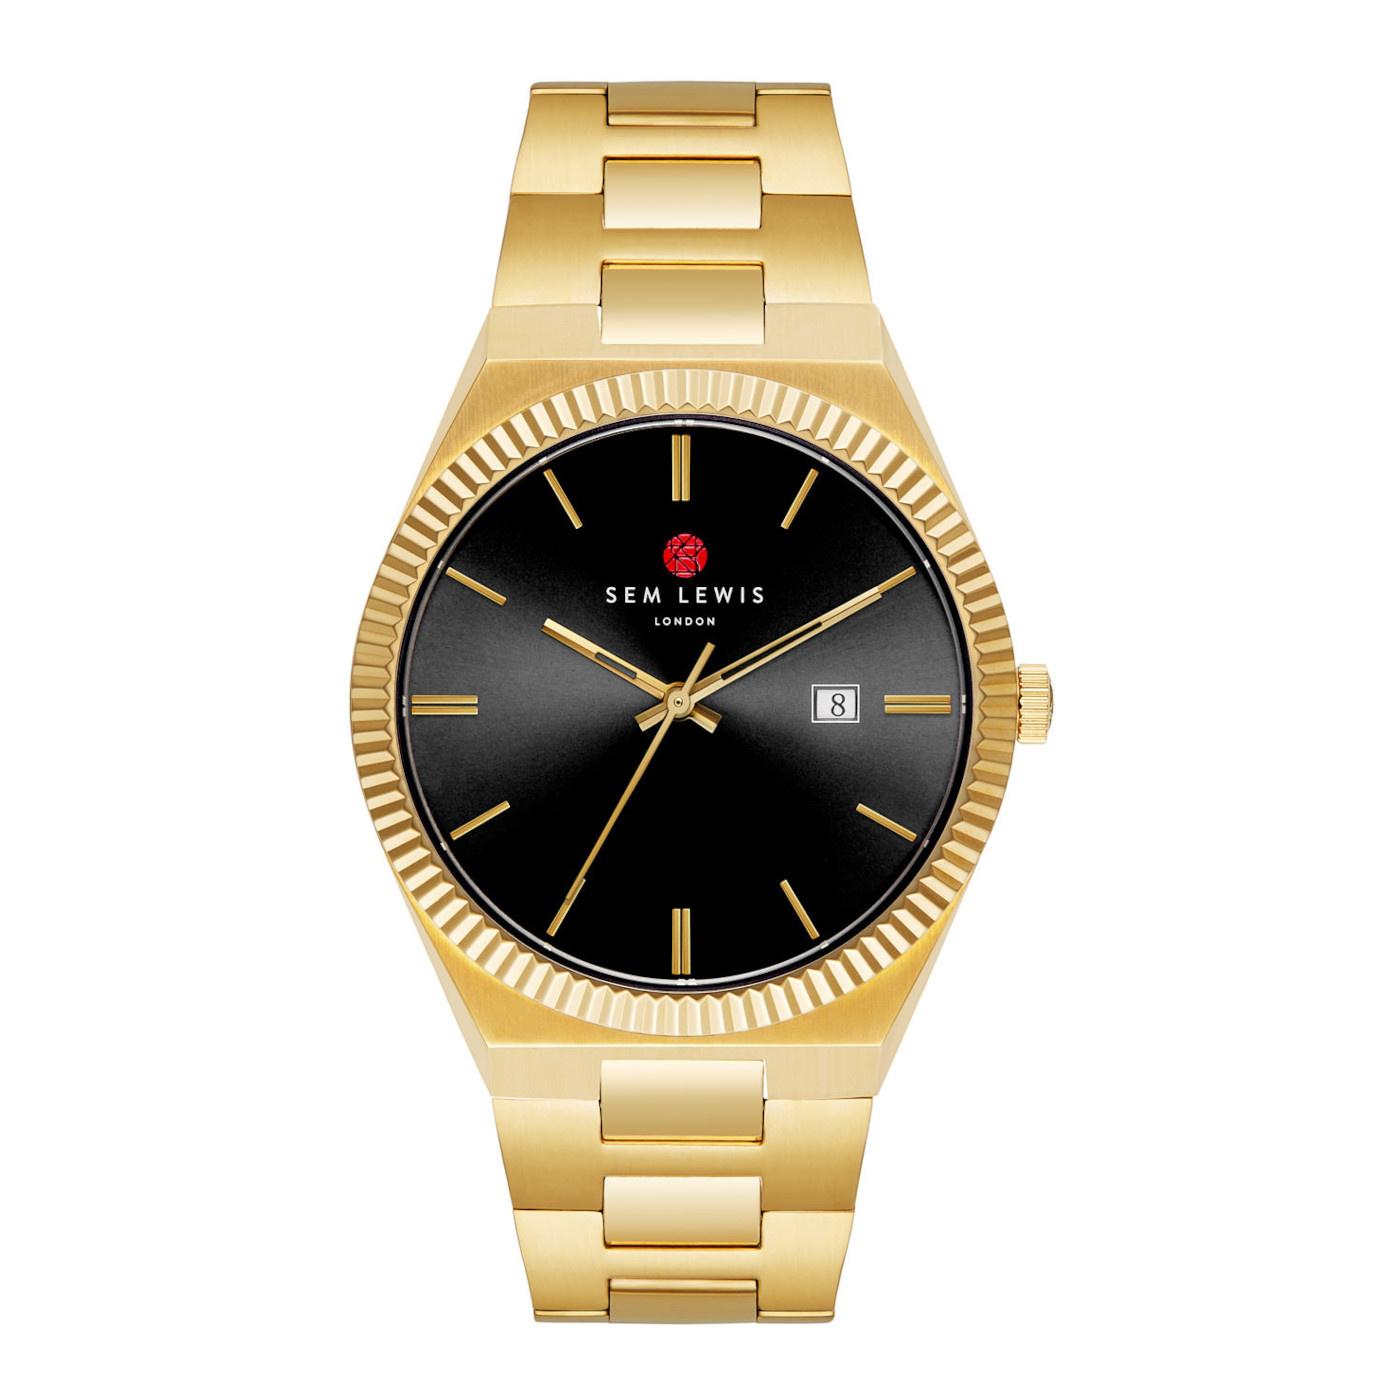 Sem Lewis Aldgate Armbanduhr schwarz/goldfarben